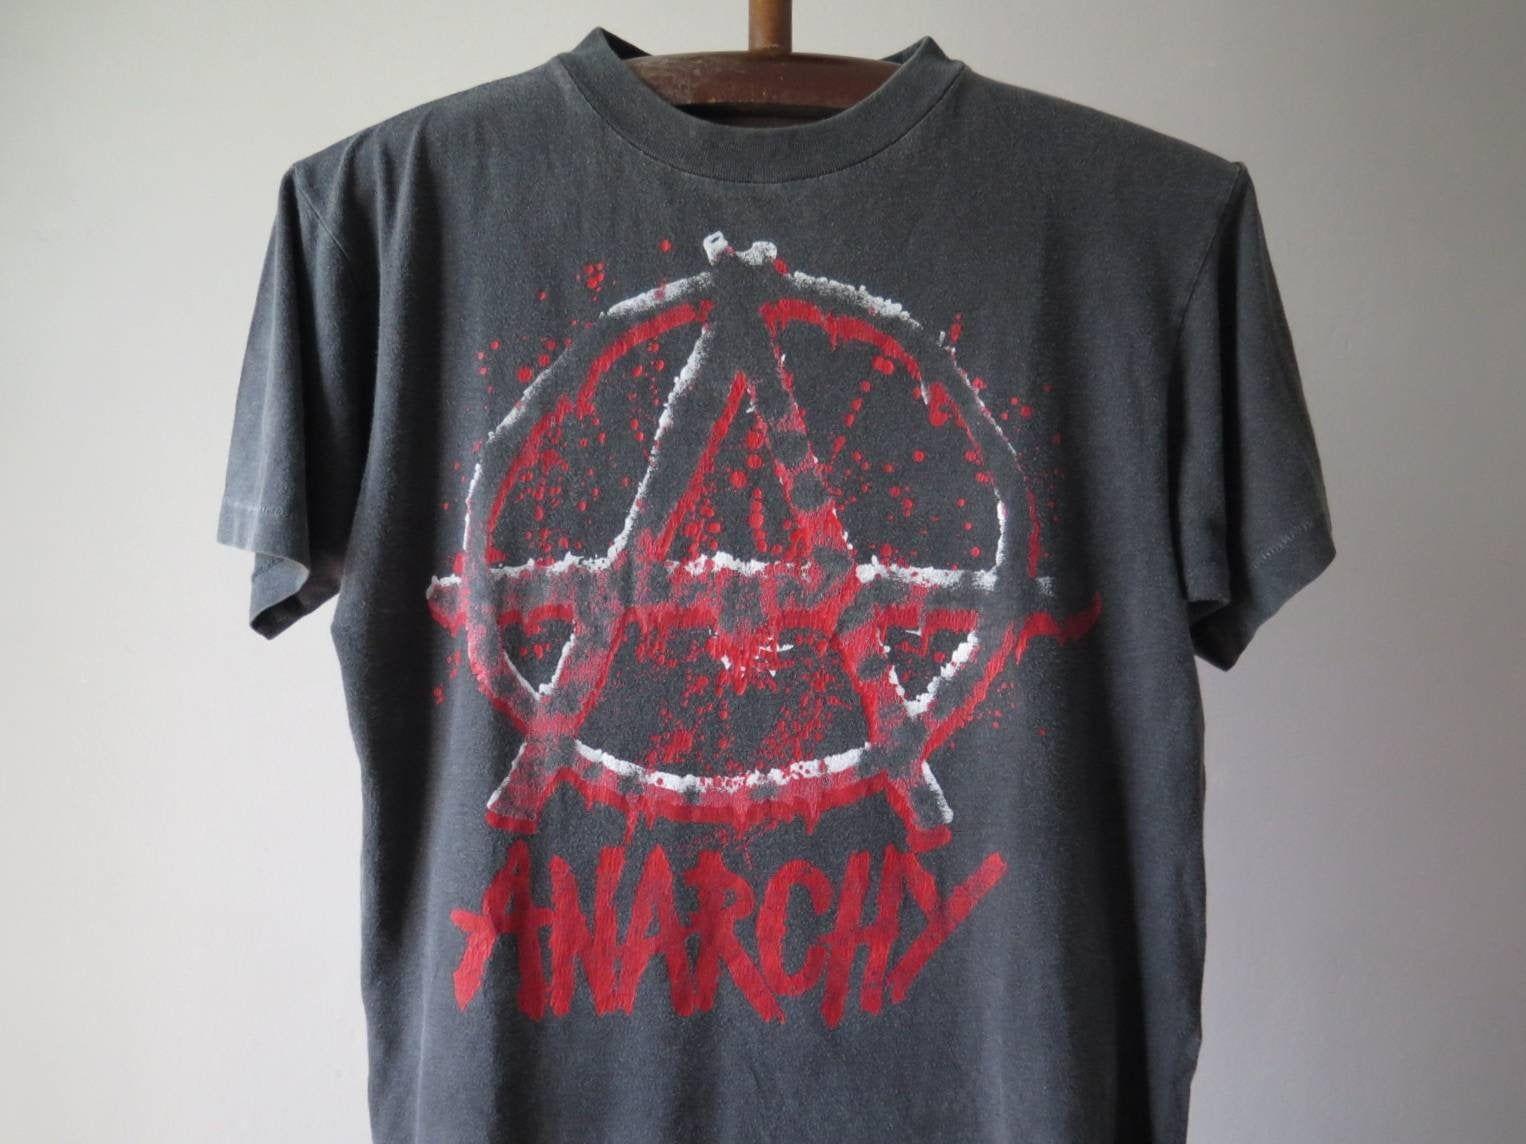 Vintage Anarchy T Shirt Anarchy Symbol T Shirt Anarchist Punk Etsy In 2021 Hippie T Shirts Punk Tshirt T Shirt